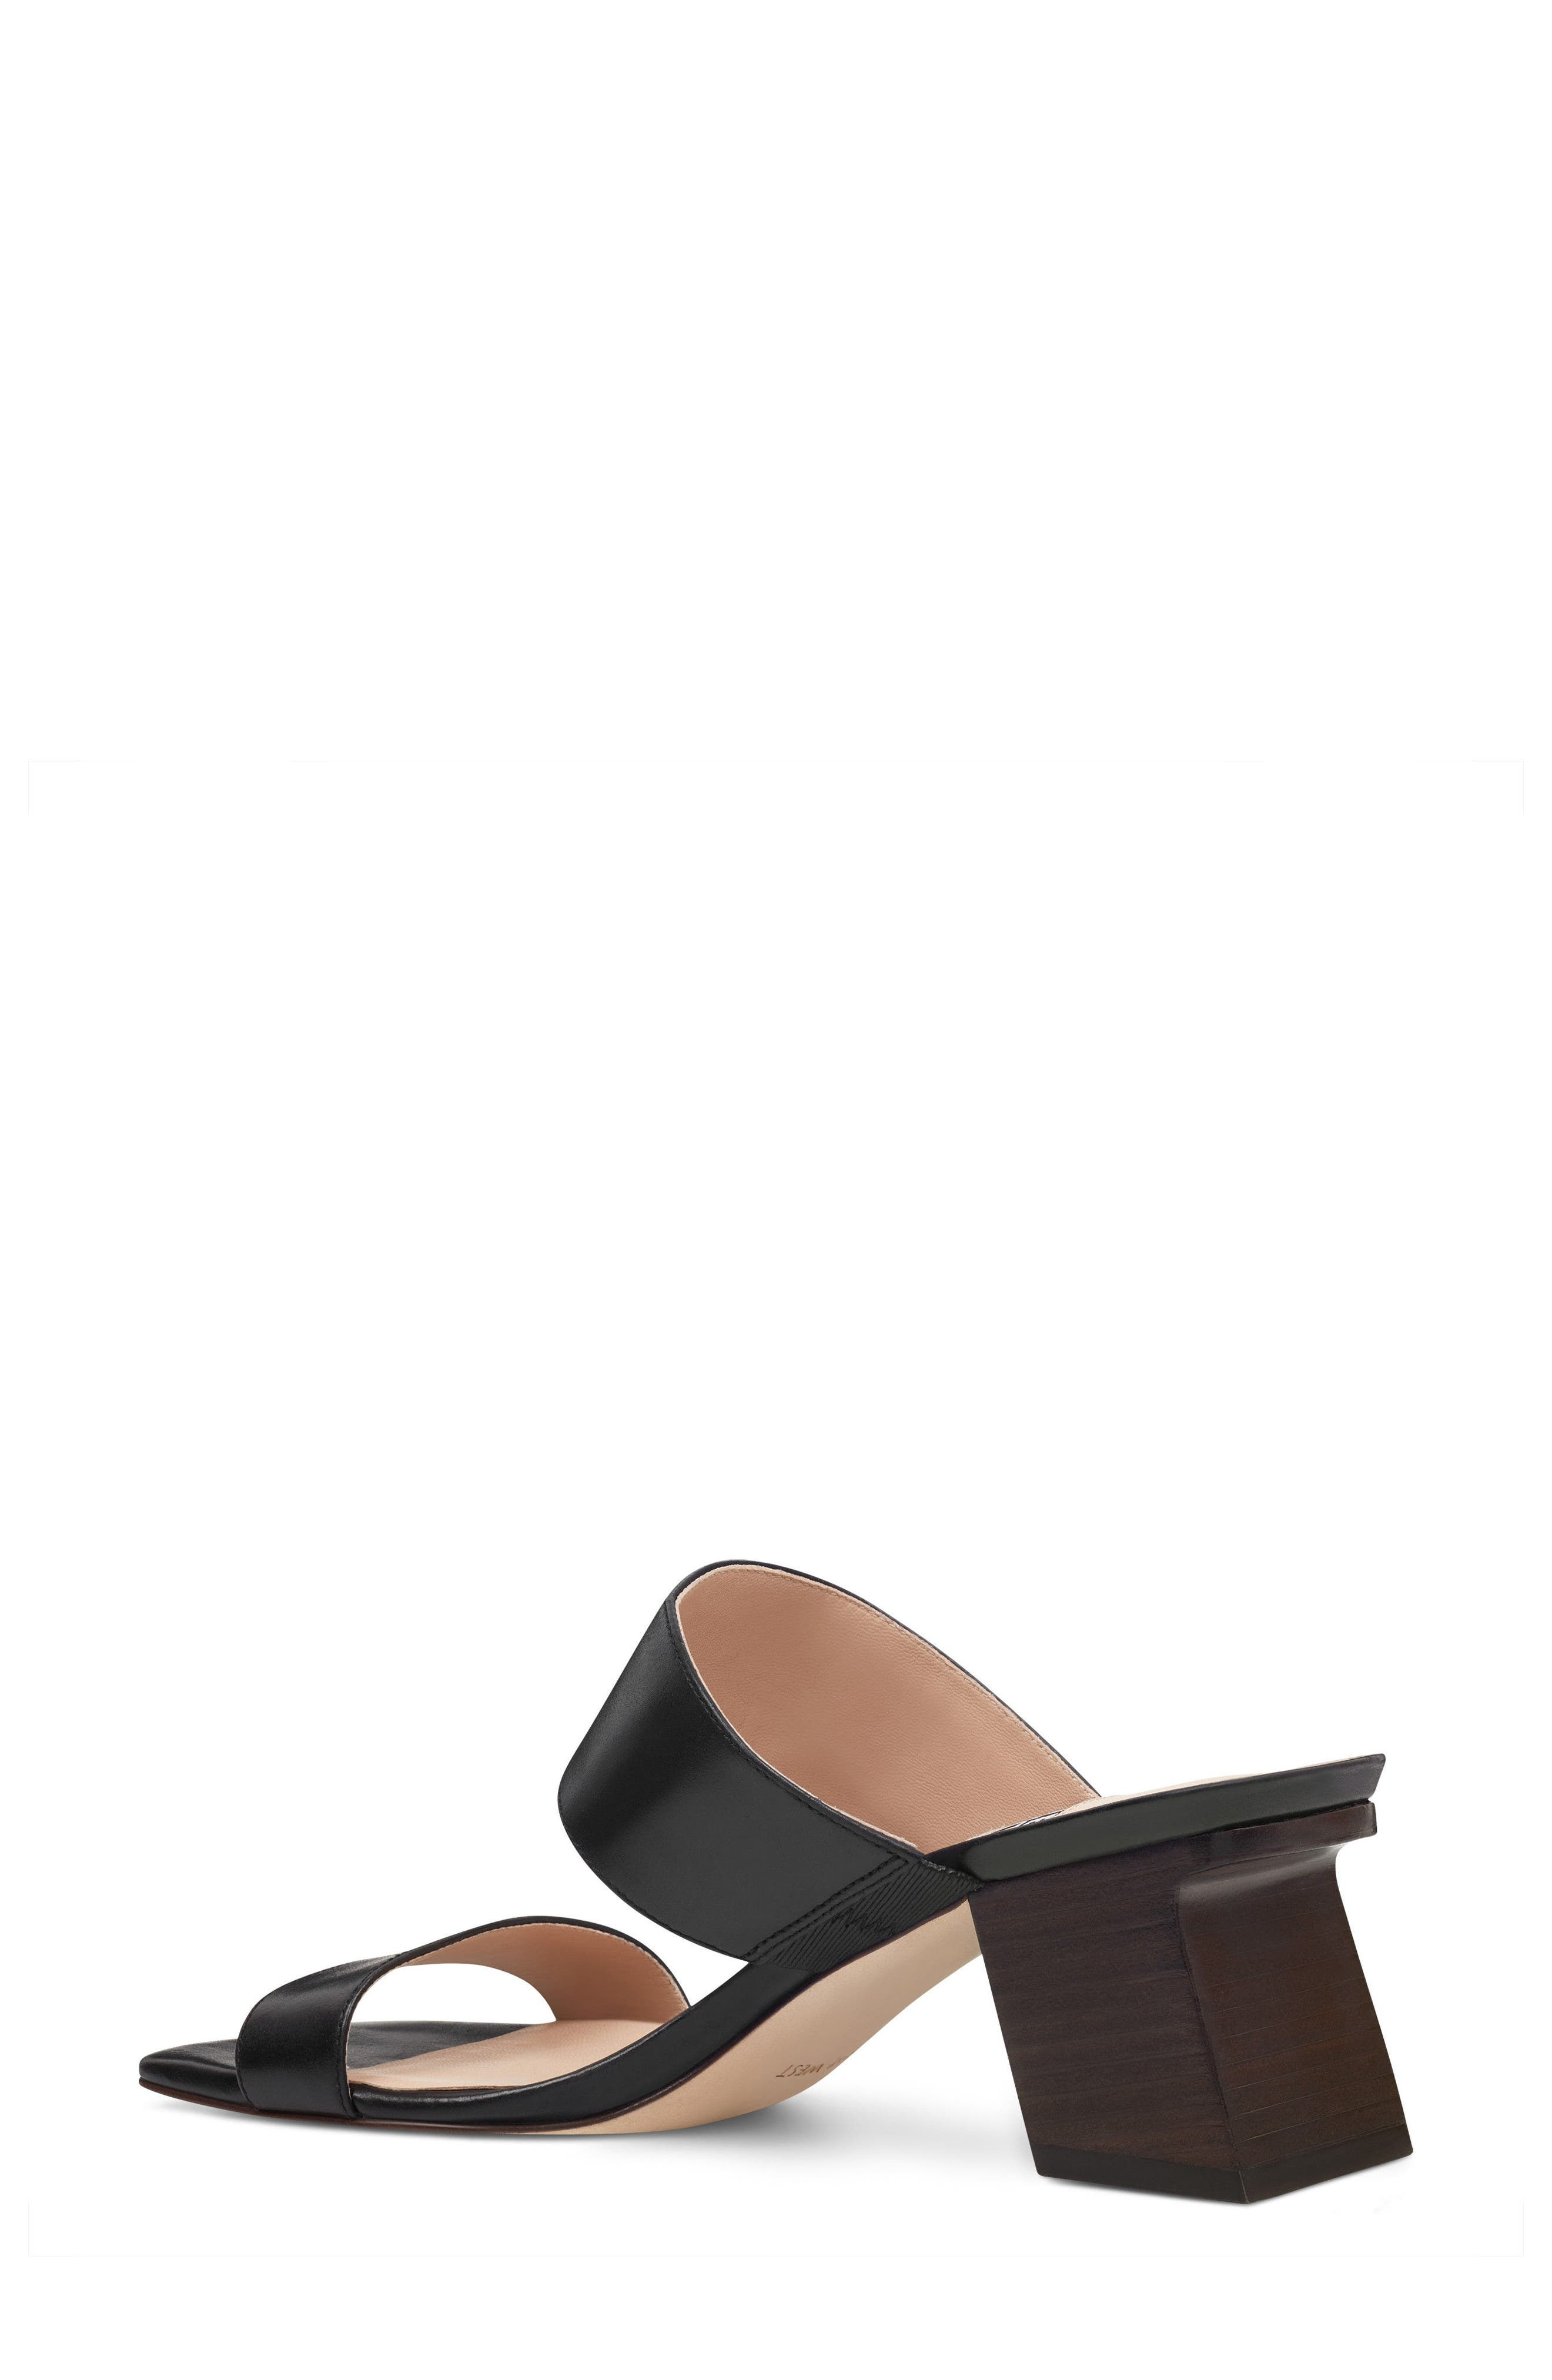 Churen - 40th Anniversary Capsule Collection Sandal,                             Alternate thumbnail 2, color,                             BLACK LEATHER